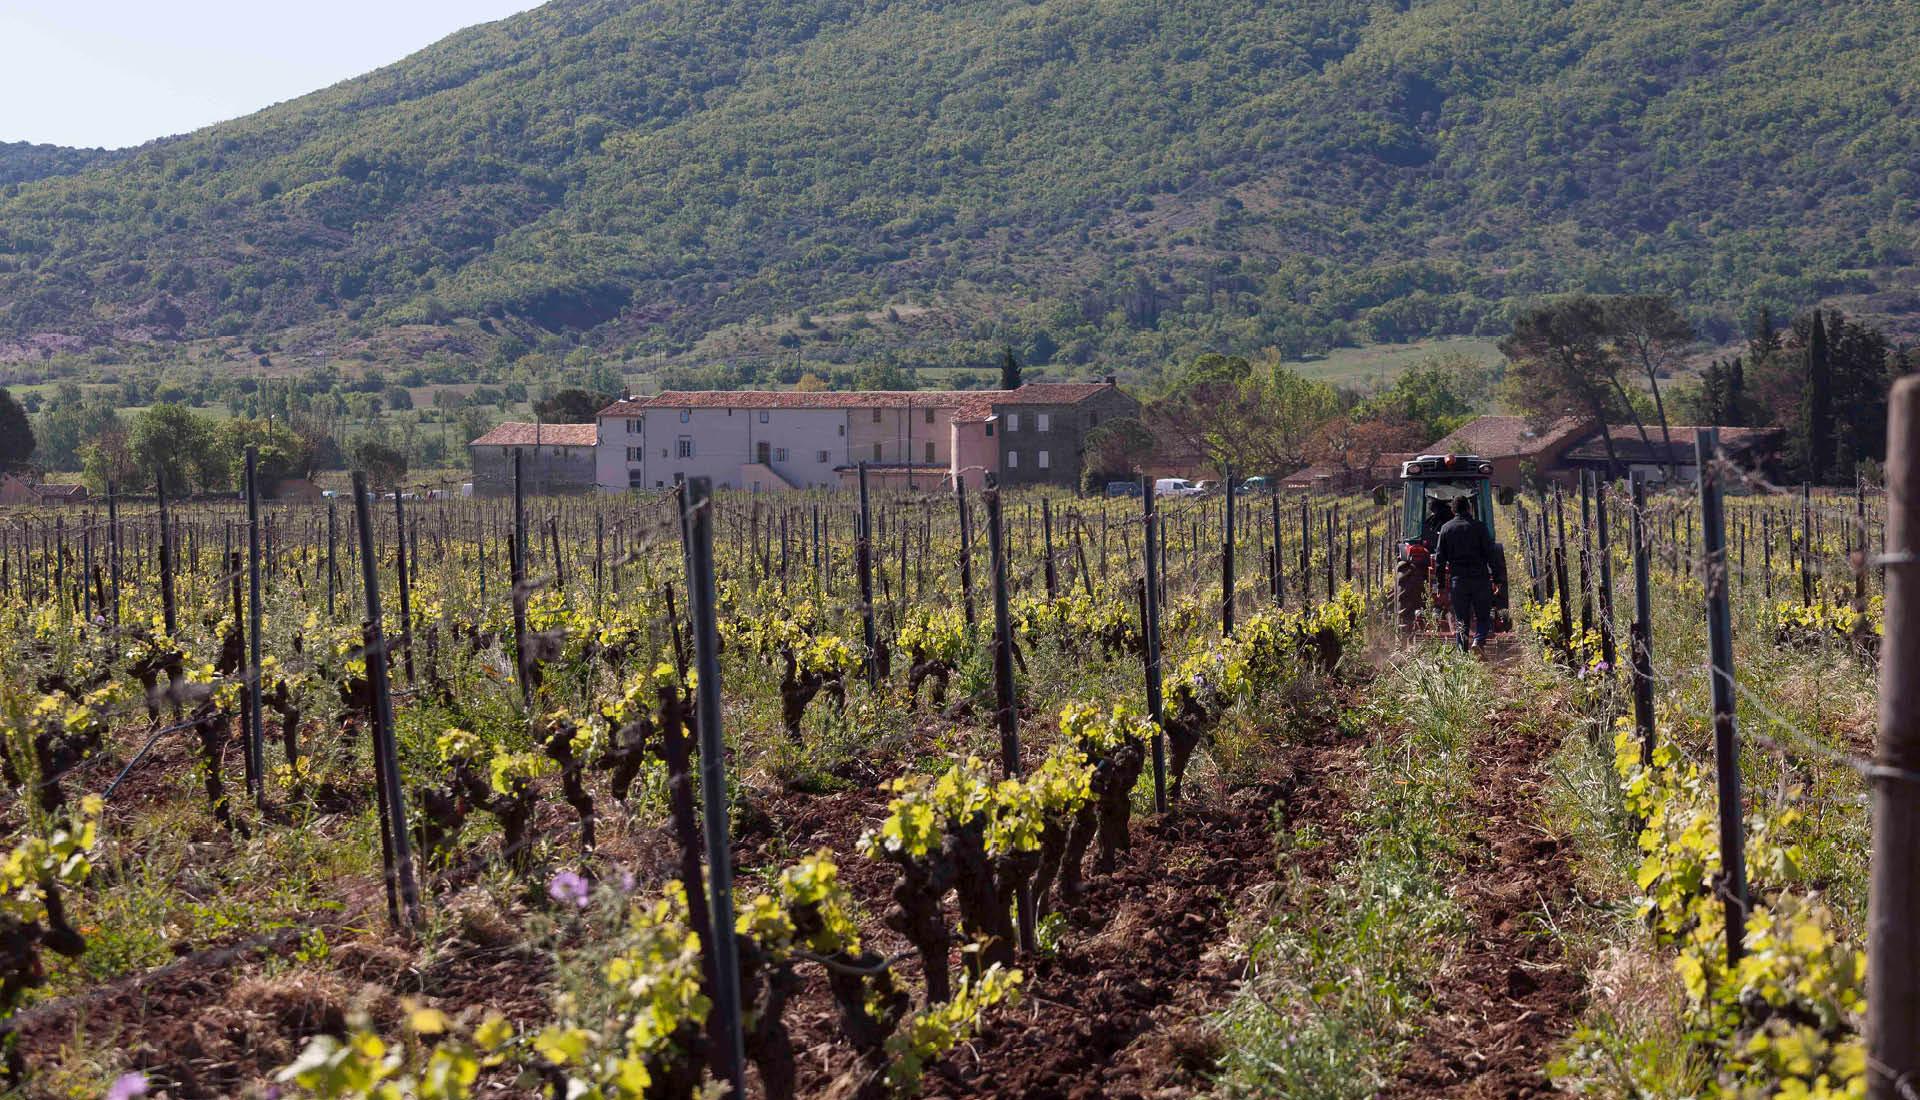 Cultures viticoles Grand Site Salagou © L.Micola 10